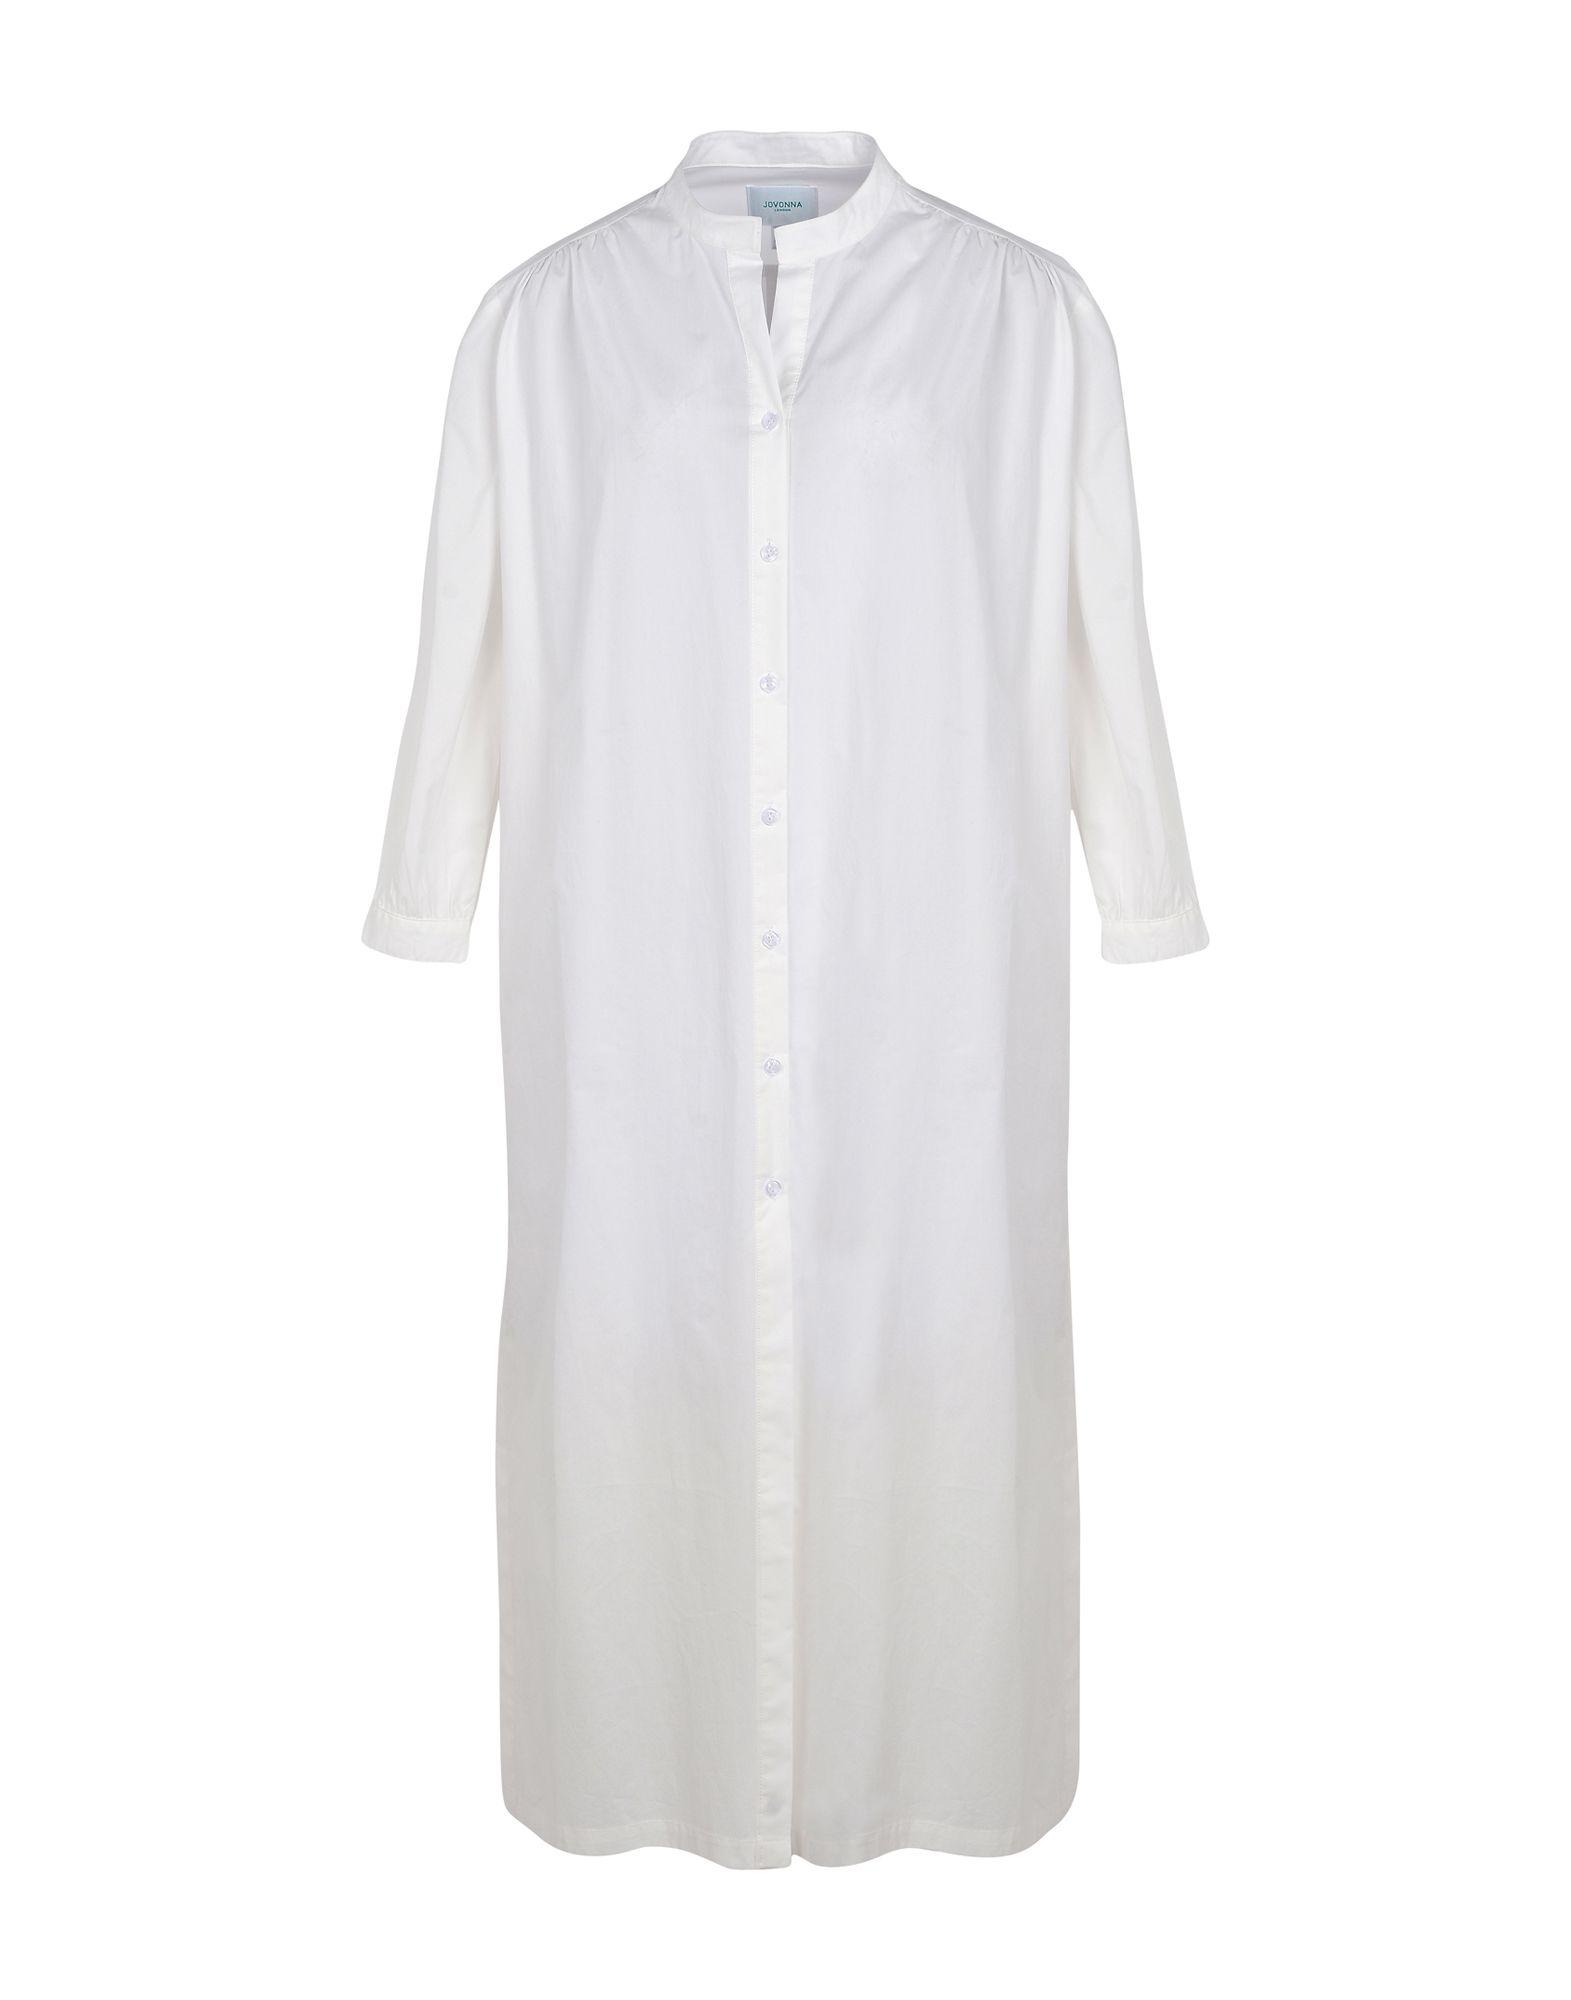 Vestito Chemisier Jovonna Dinua Dress - Donna - Acquista online su FvxZjTe